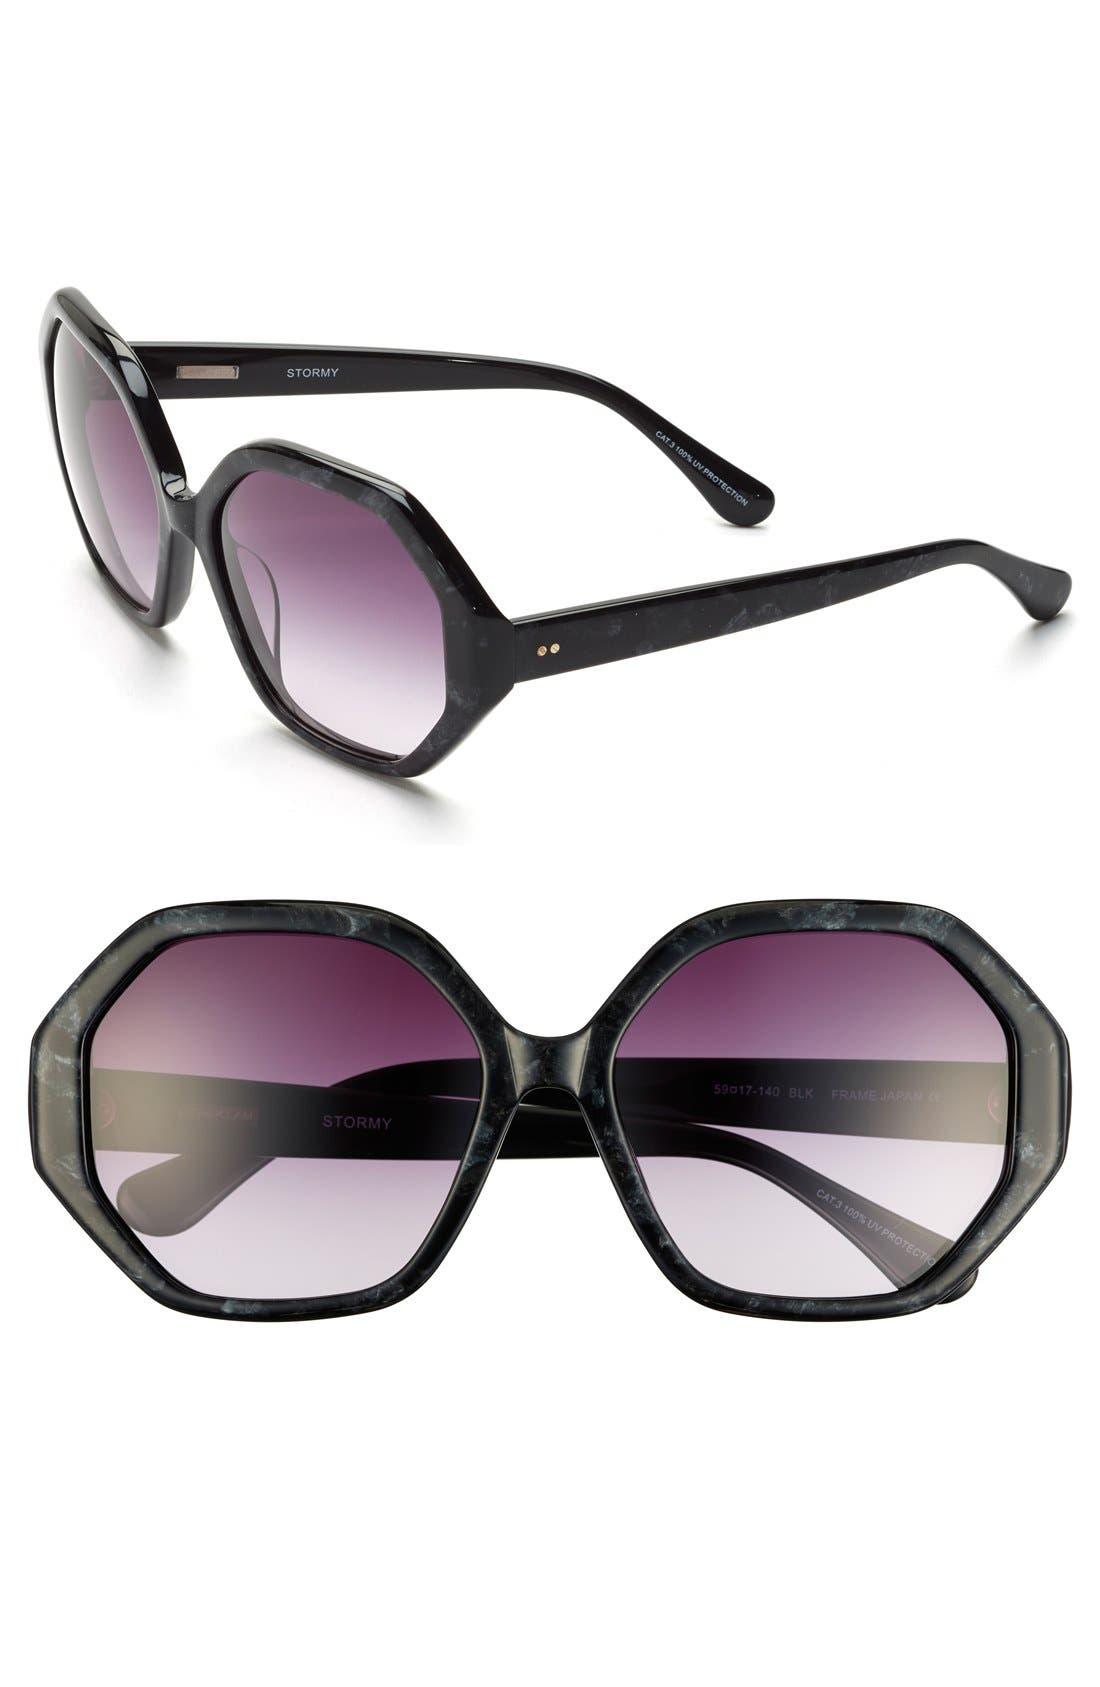 Alternate Image 1 Selected - Derek Lam 'Stormy' 59mm Sunglasses